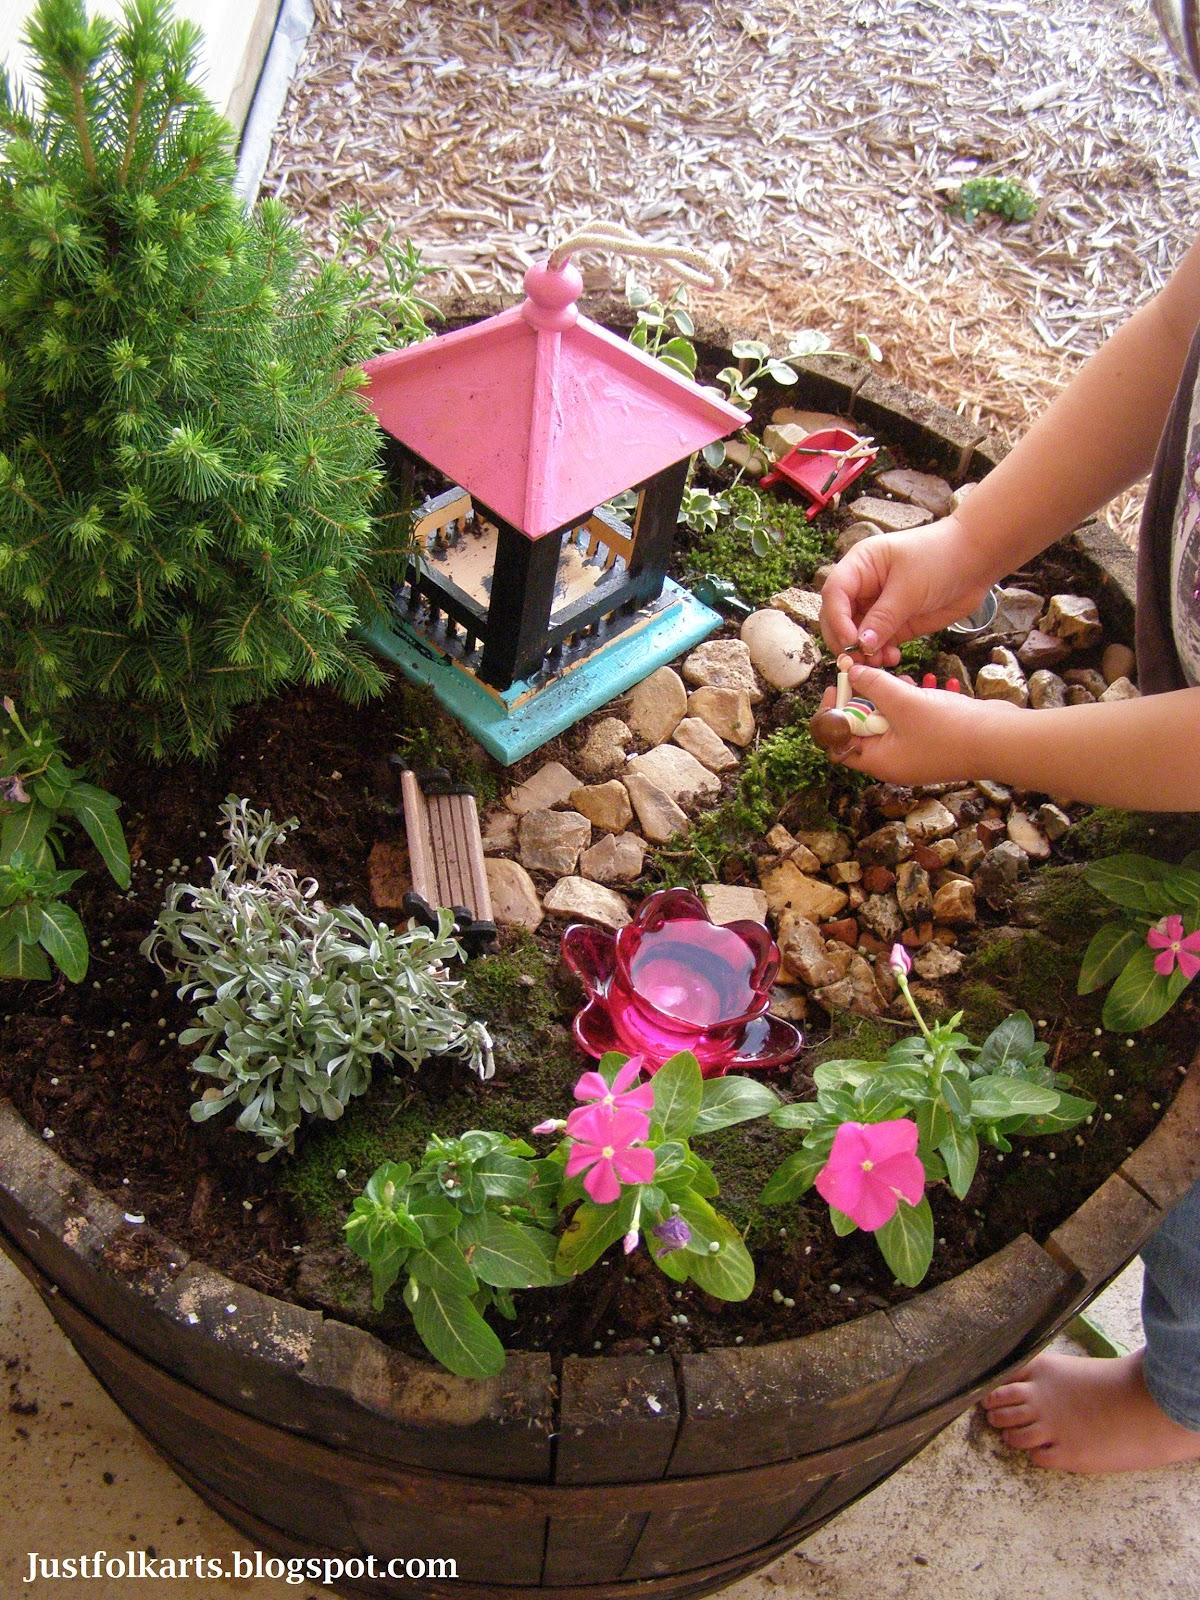 Just Folk Art: Making Our Very Own Fairy Garden Part 1